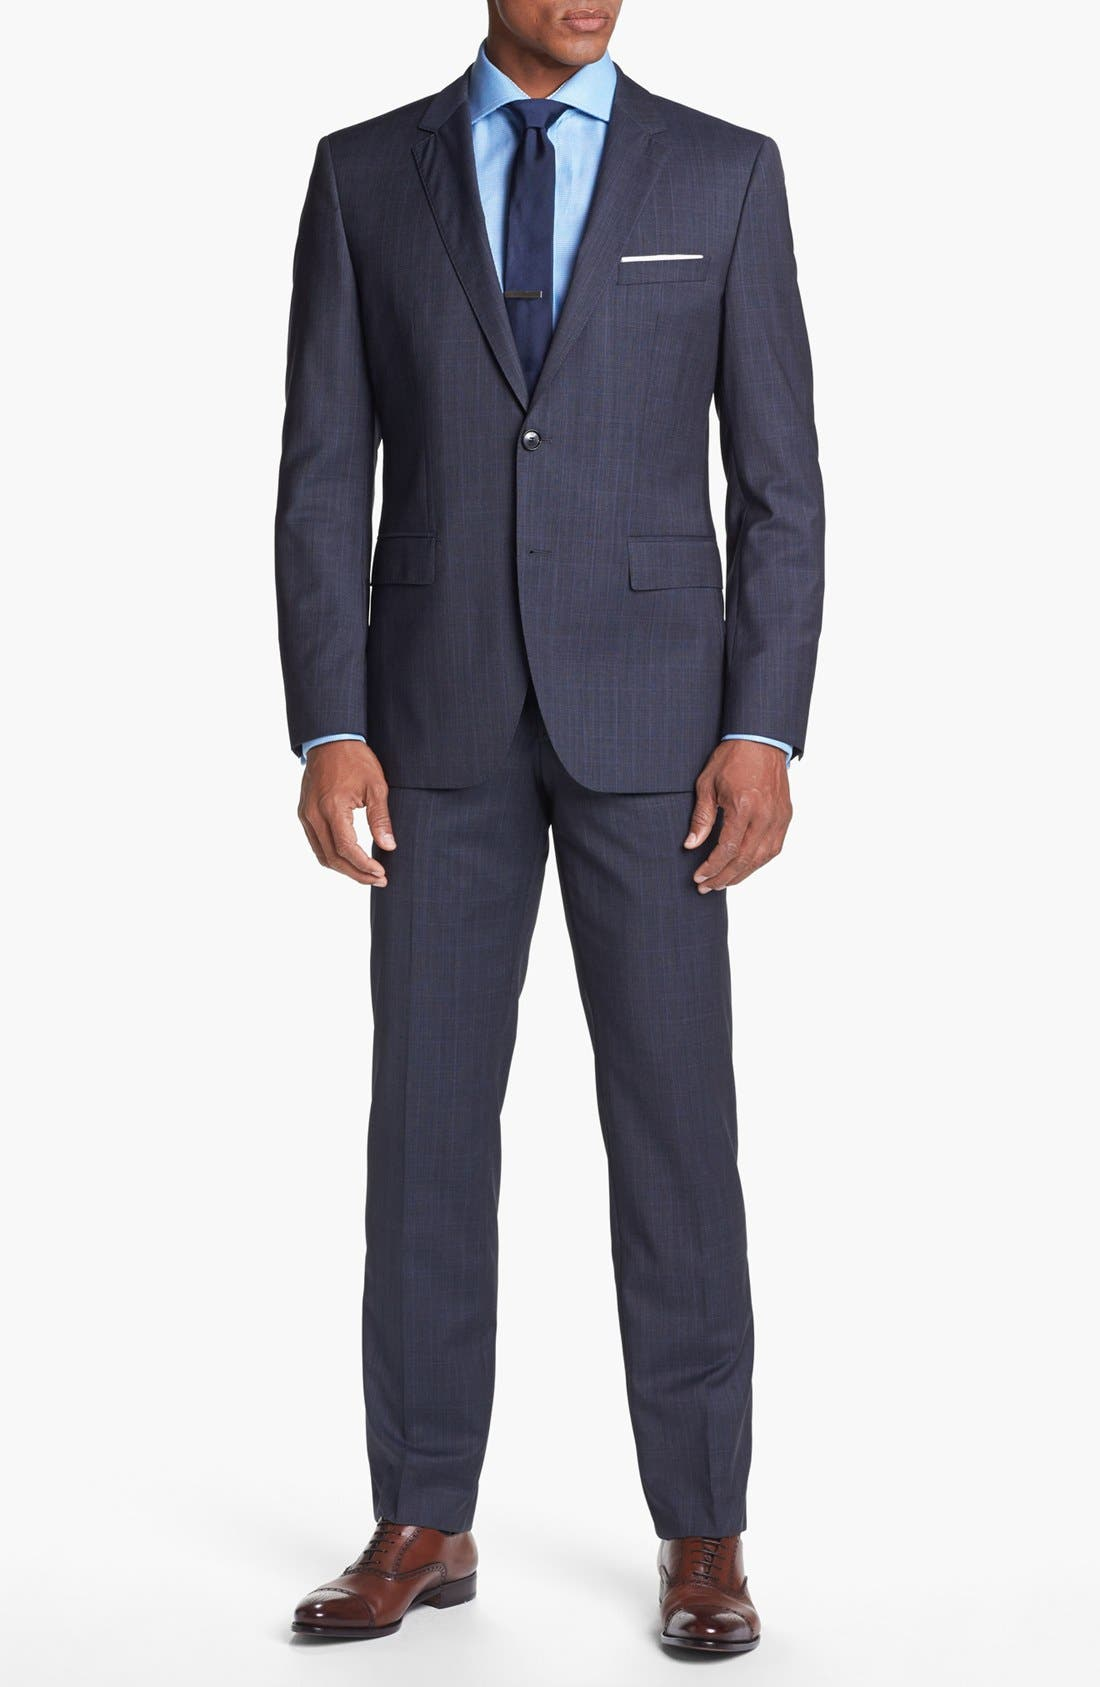 Main Image - BOSS HUGO BOSS 'James/Sharp' Trim Fit Plaid Suit